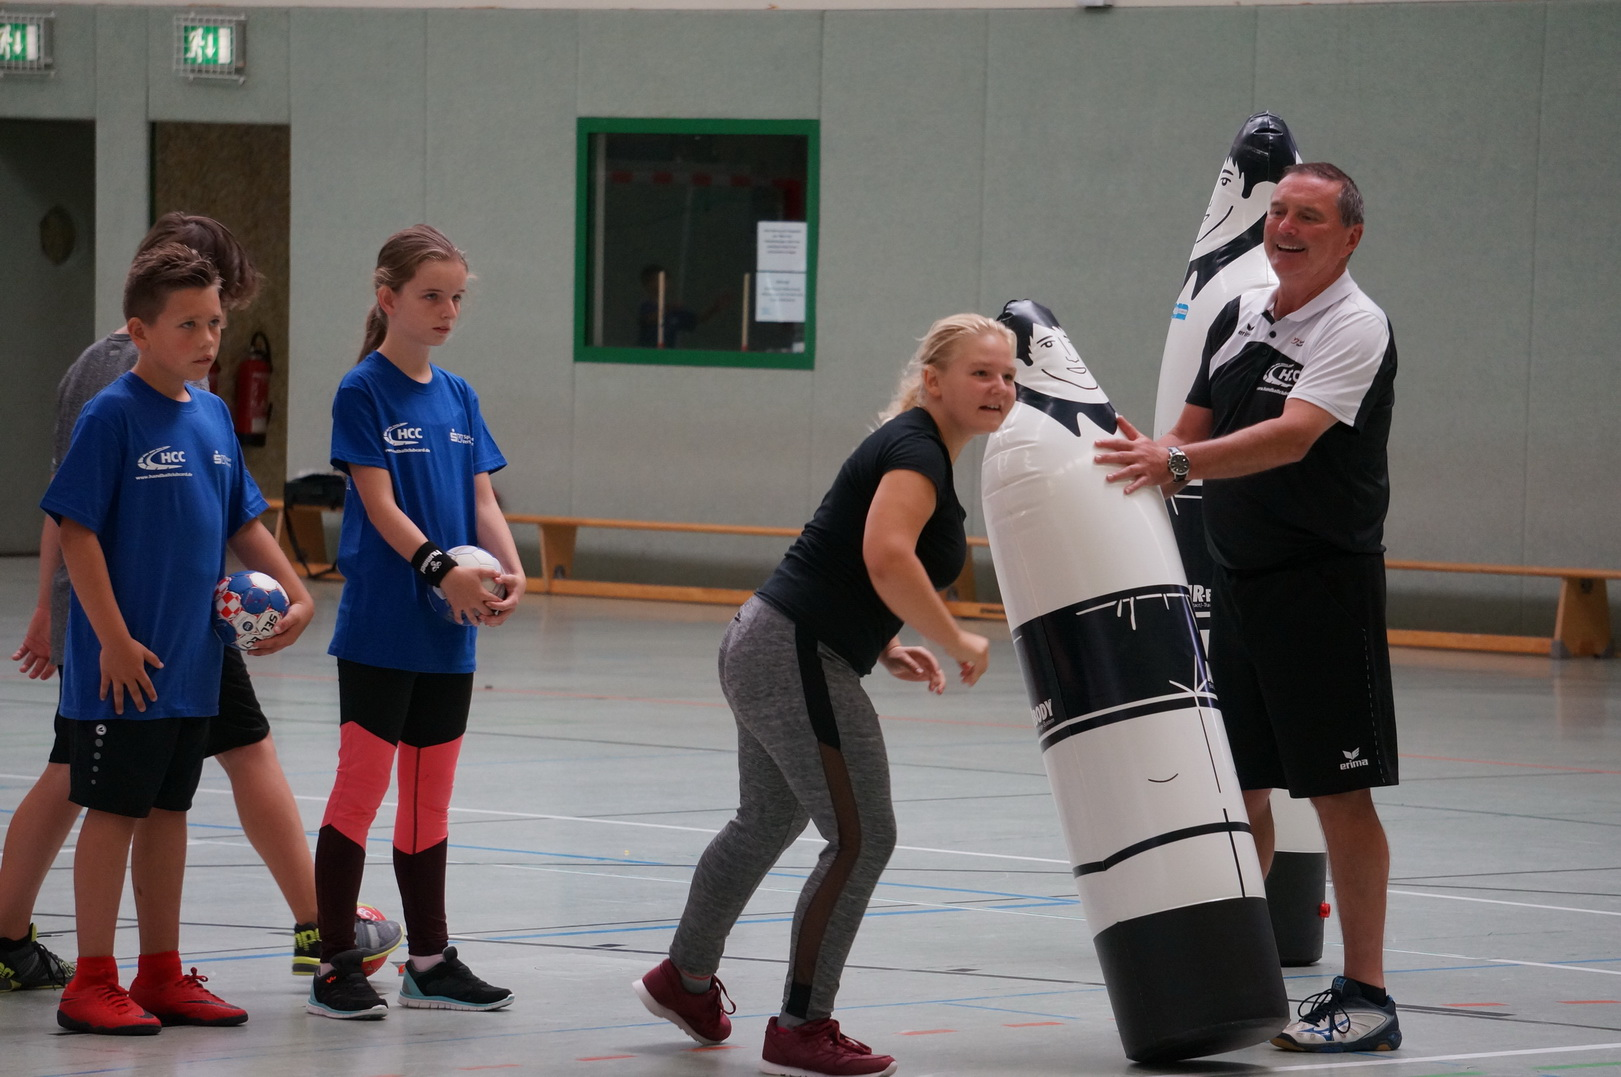 201808_Handballcamp_SDH_MG_222w